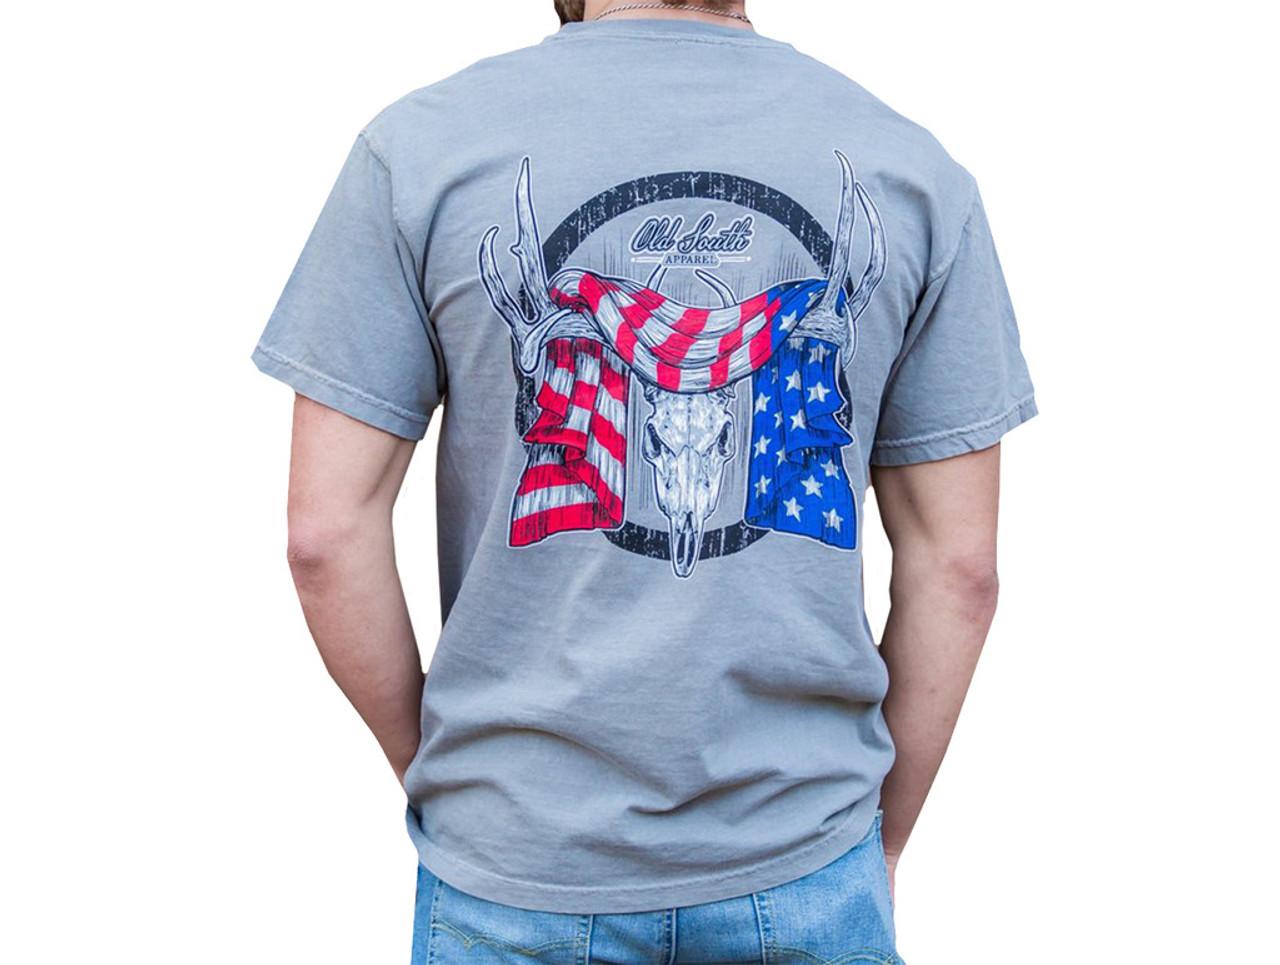 8caa508e7 Old South Deer Antlers Flag Comfort Color Short Sleeve T-shirt - Trenz Shirt  Company